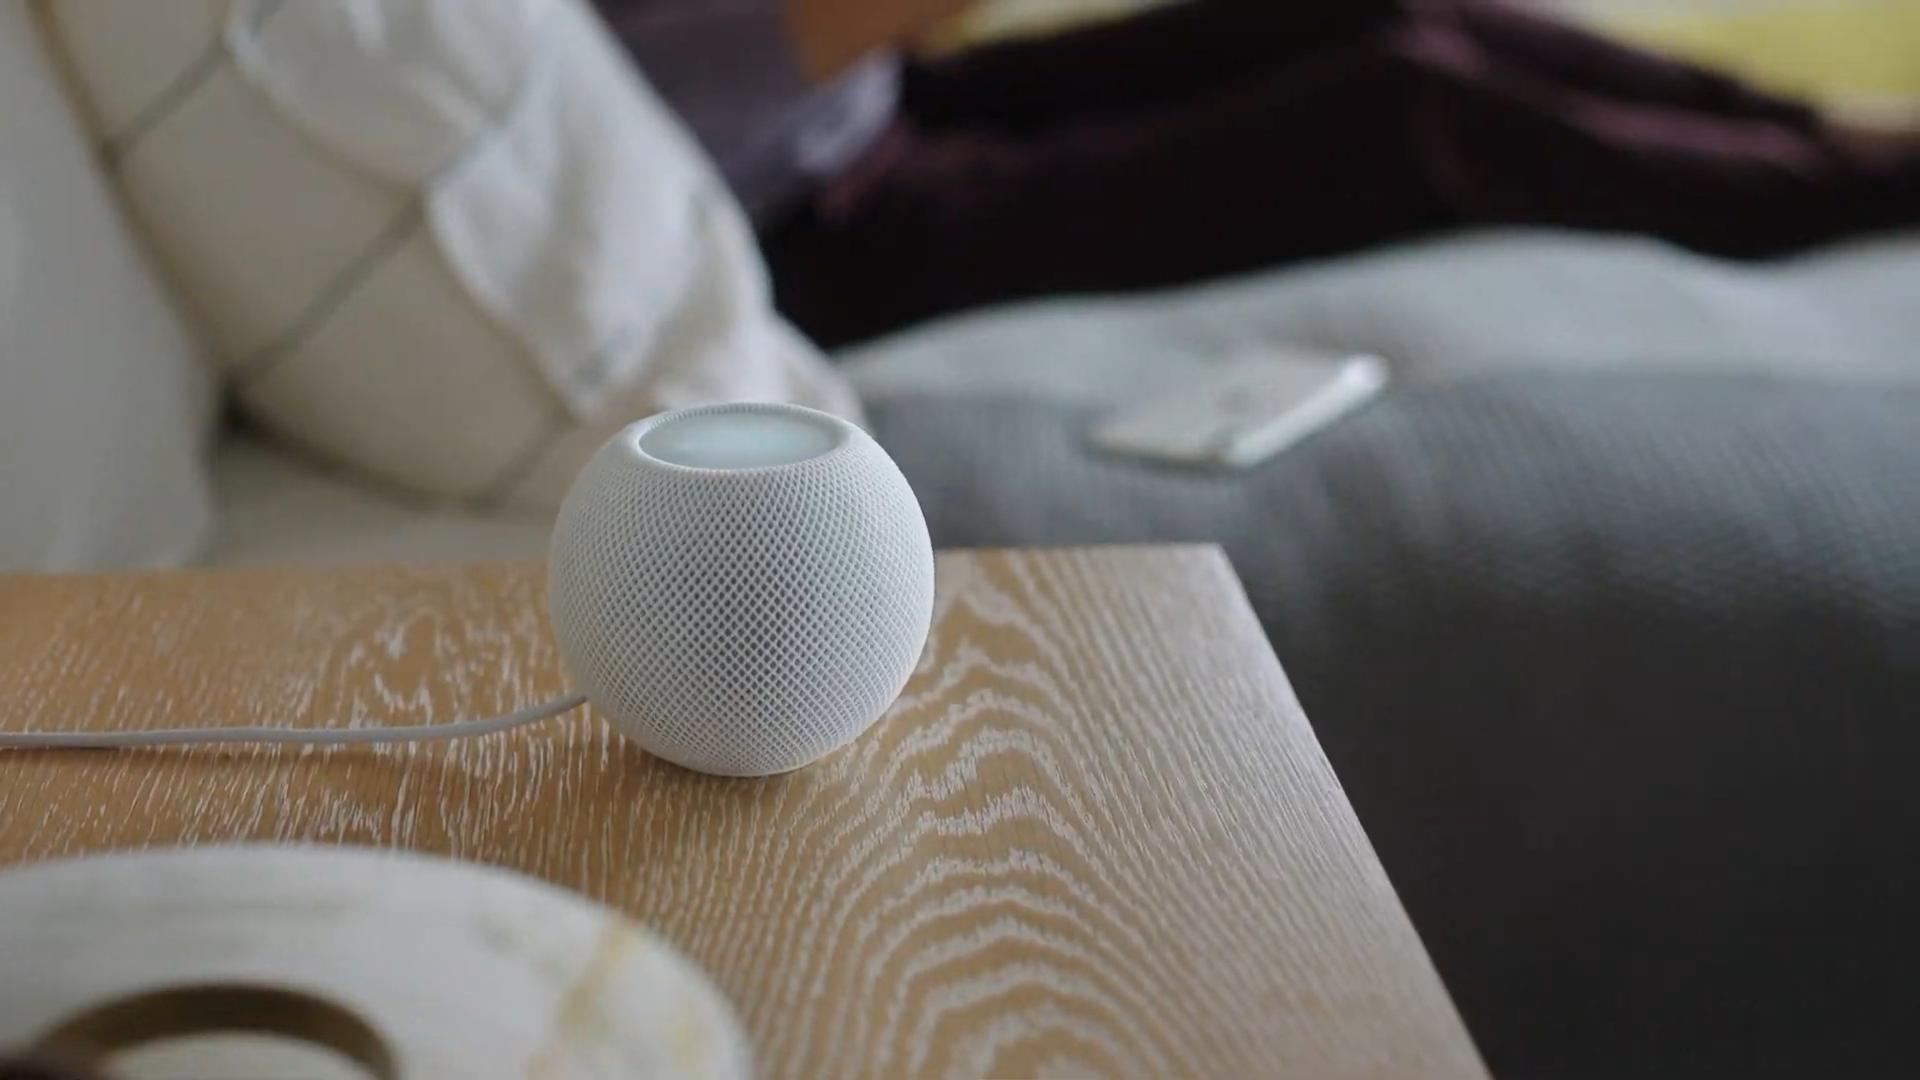 1602621713 143 HomePod mini compact smart speaker from Apple for